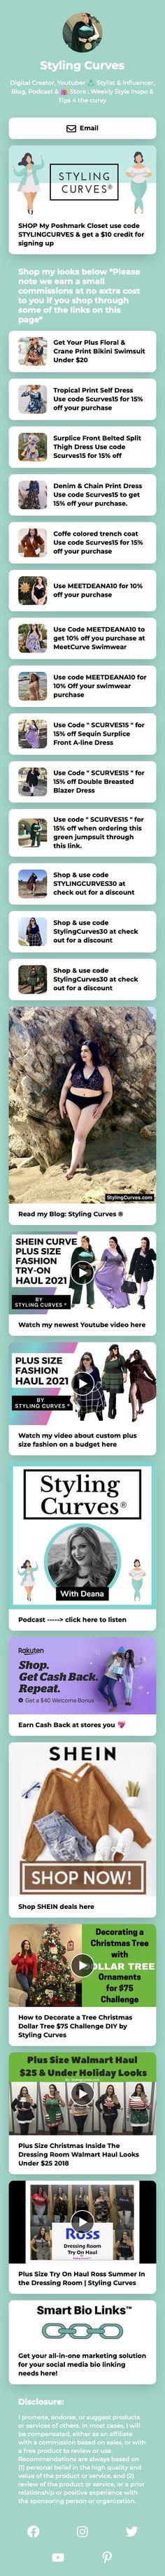 #DigitalCreator, Youtuber 👗 #Stylist & #Influencer, Blog, Podcast & 🛍 Store: Weekly Style Inspo & Tips 4 the curvy #pinterestinspired